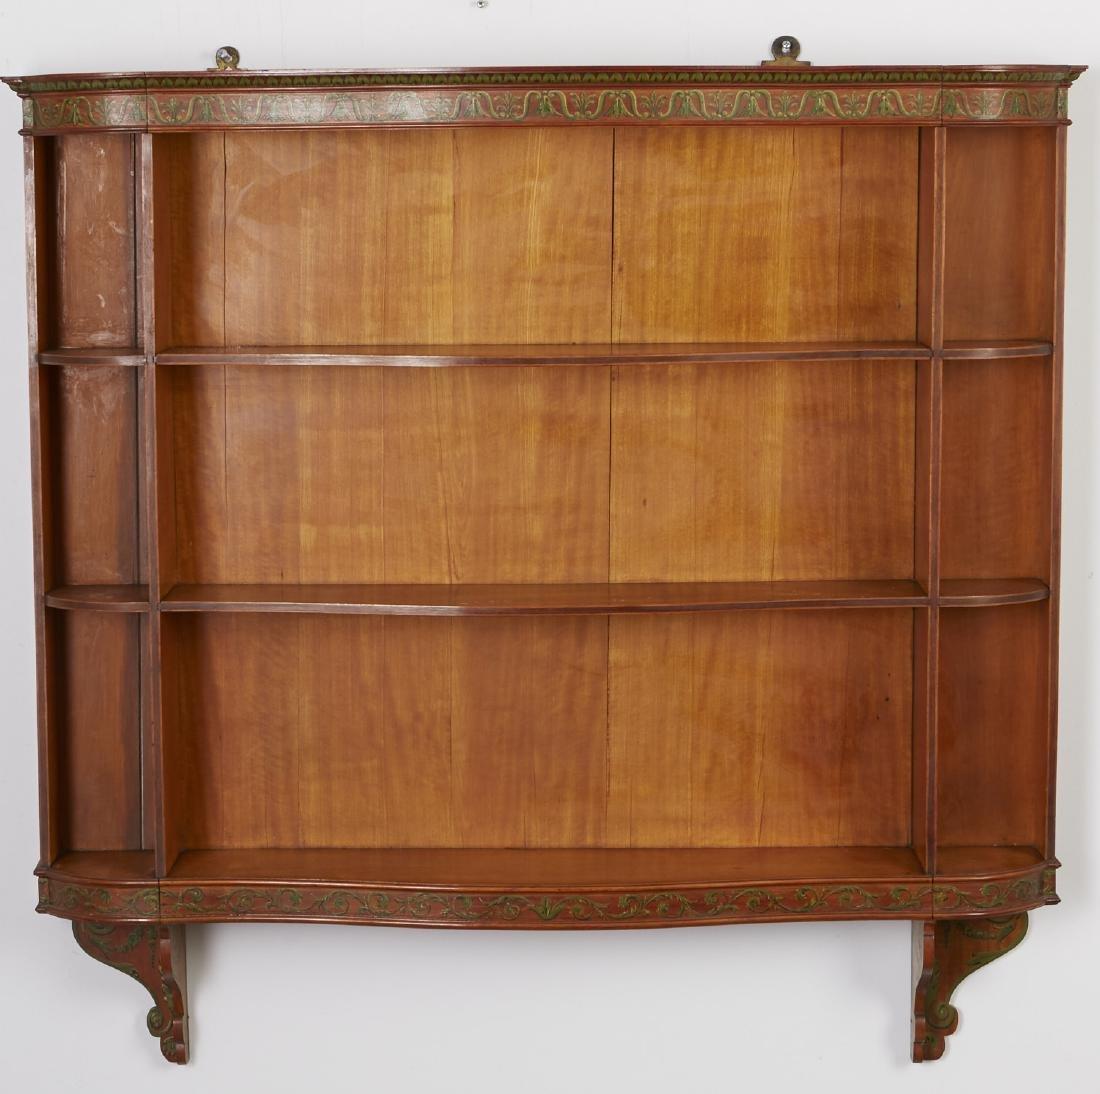 Adams Style Satinwood Wall Shelf